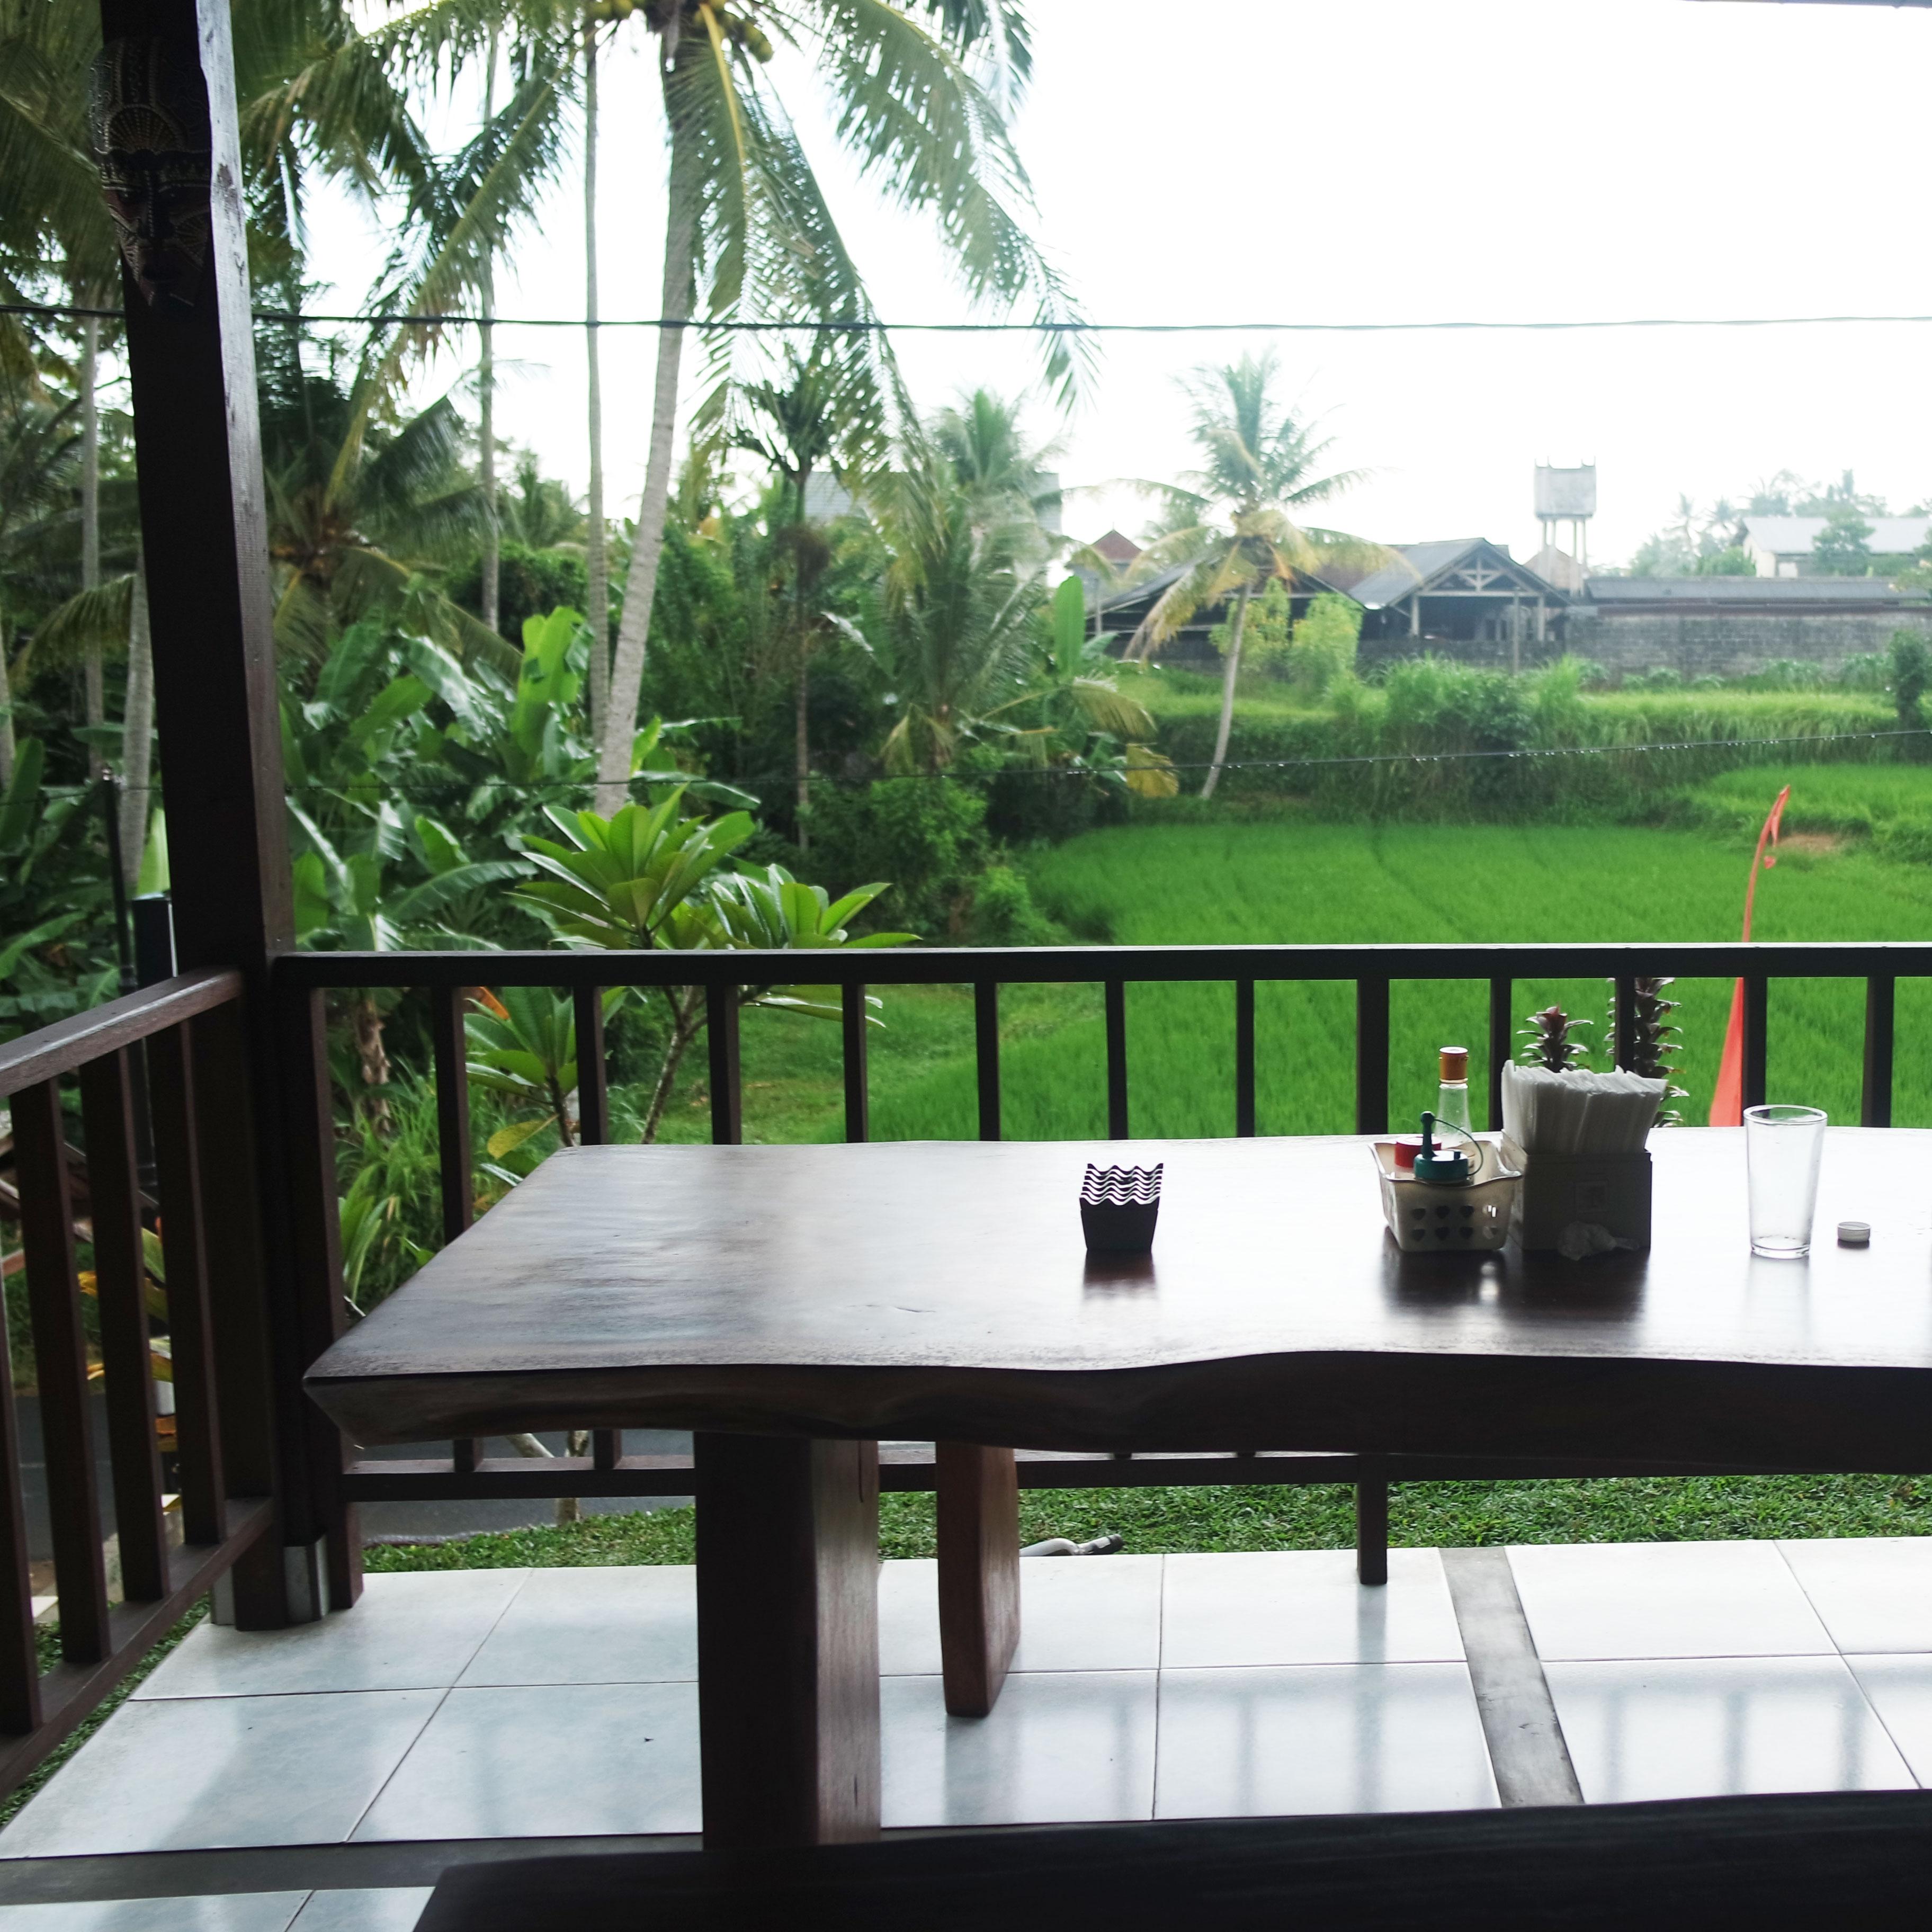 ubud-warung-datas-bbq-ribs-bali-restaurant-blog-avis-vue